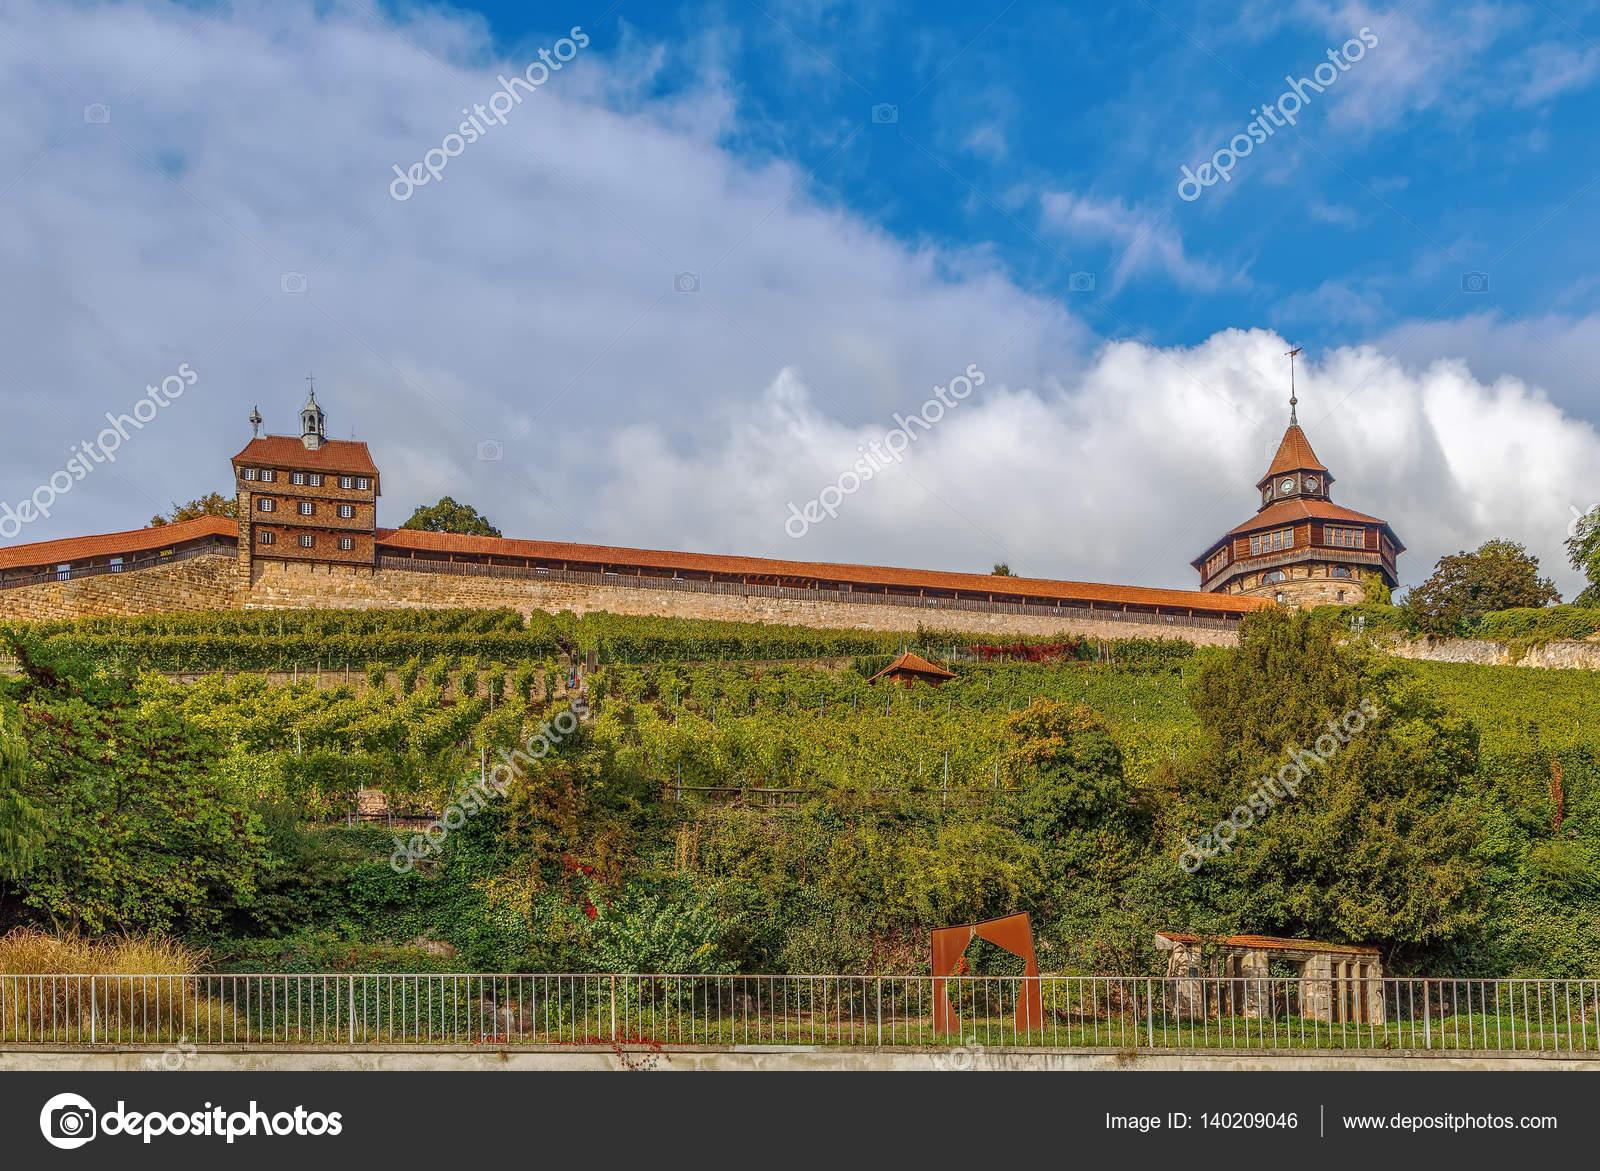 Esslingen Castle Burg Germany Stockfoto Borisb17 140209046